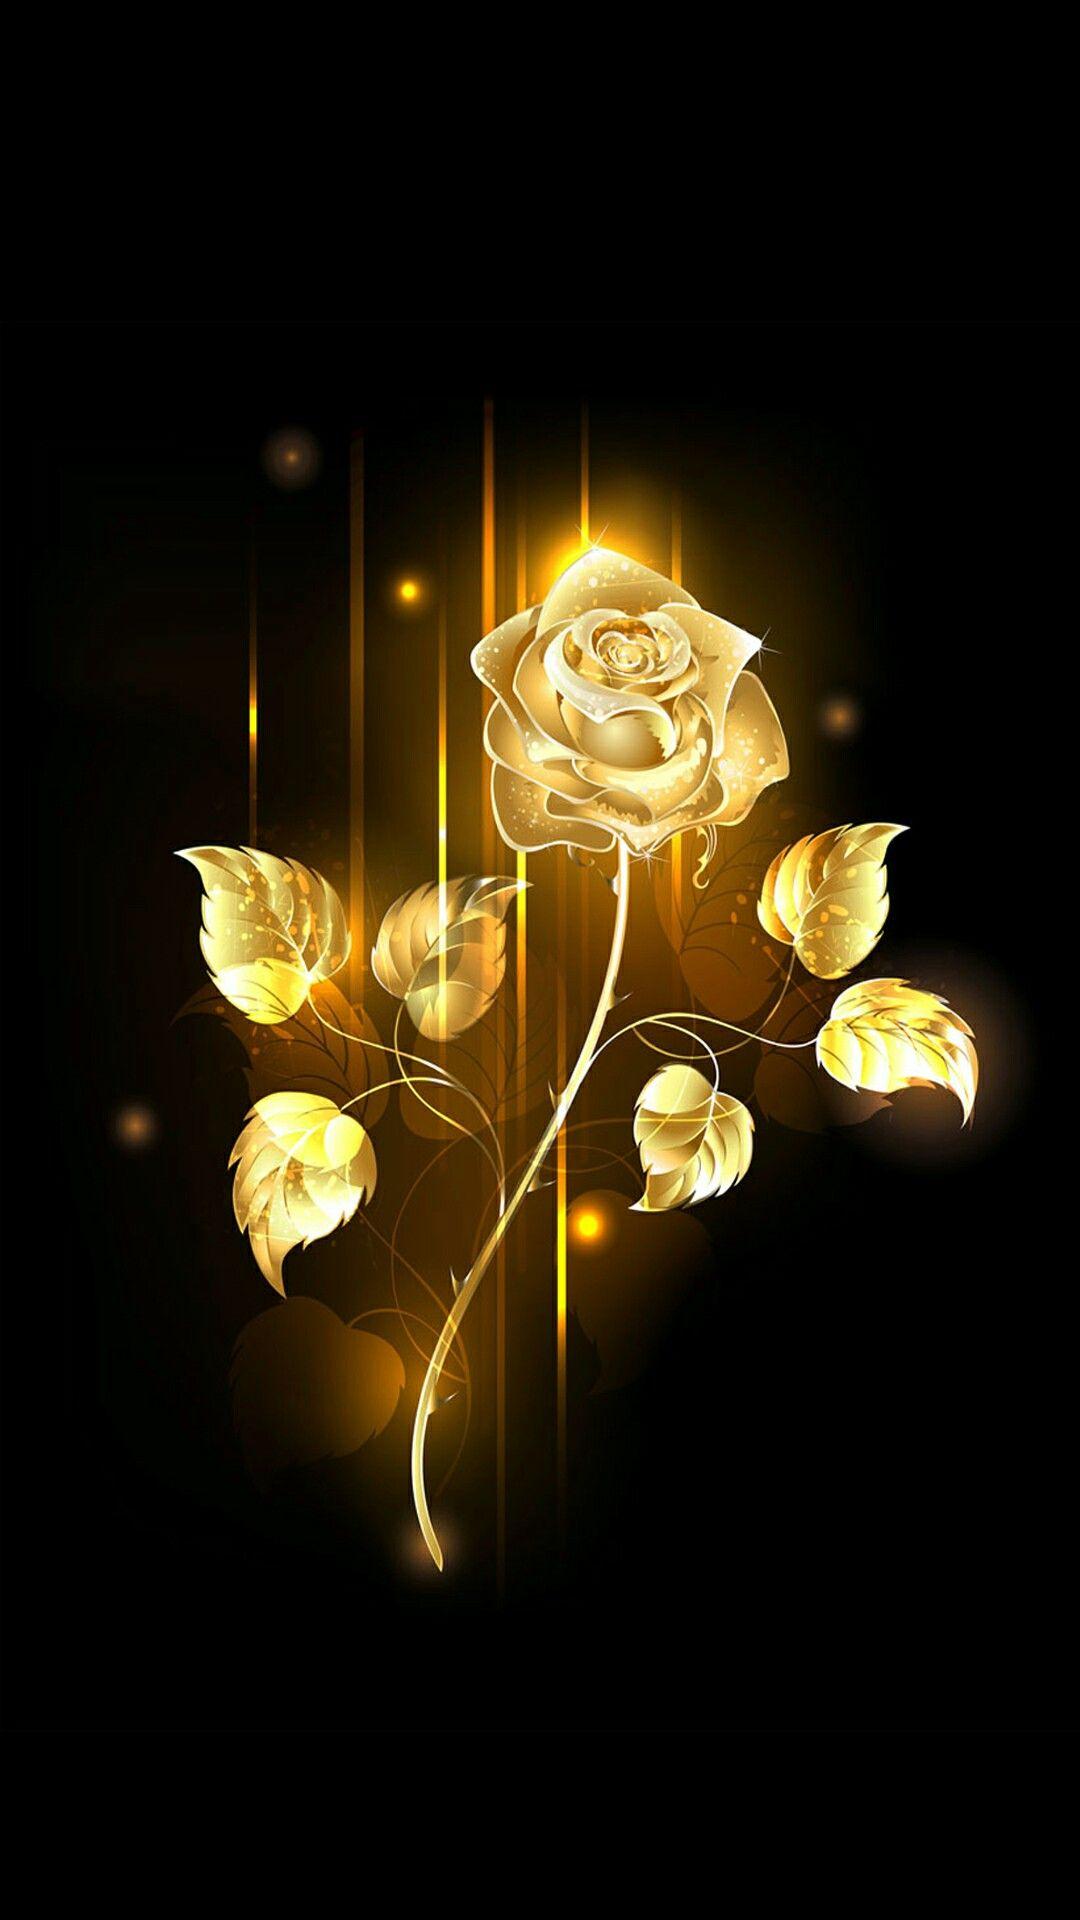 Golden Rose Gold Wallpaper Background Gold Wallpaper Rose Gold Wallpaper